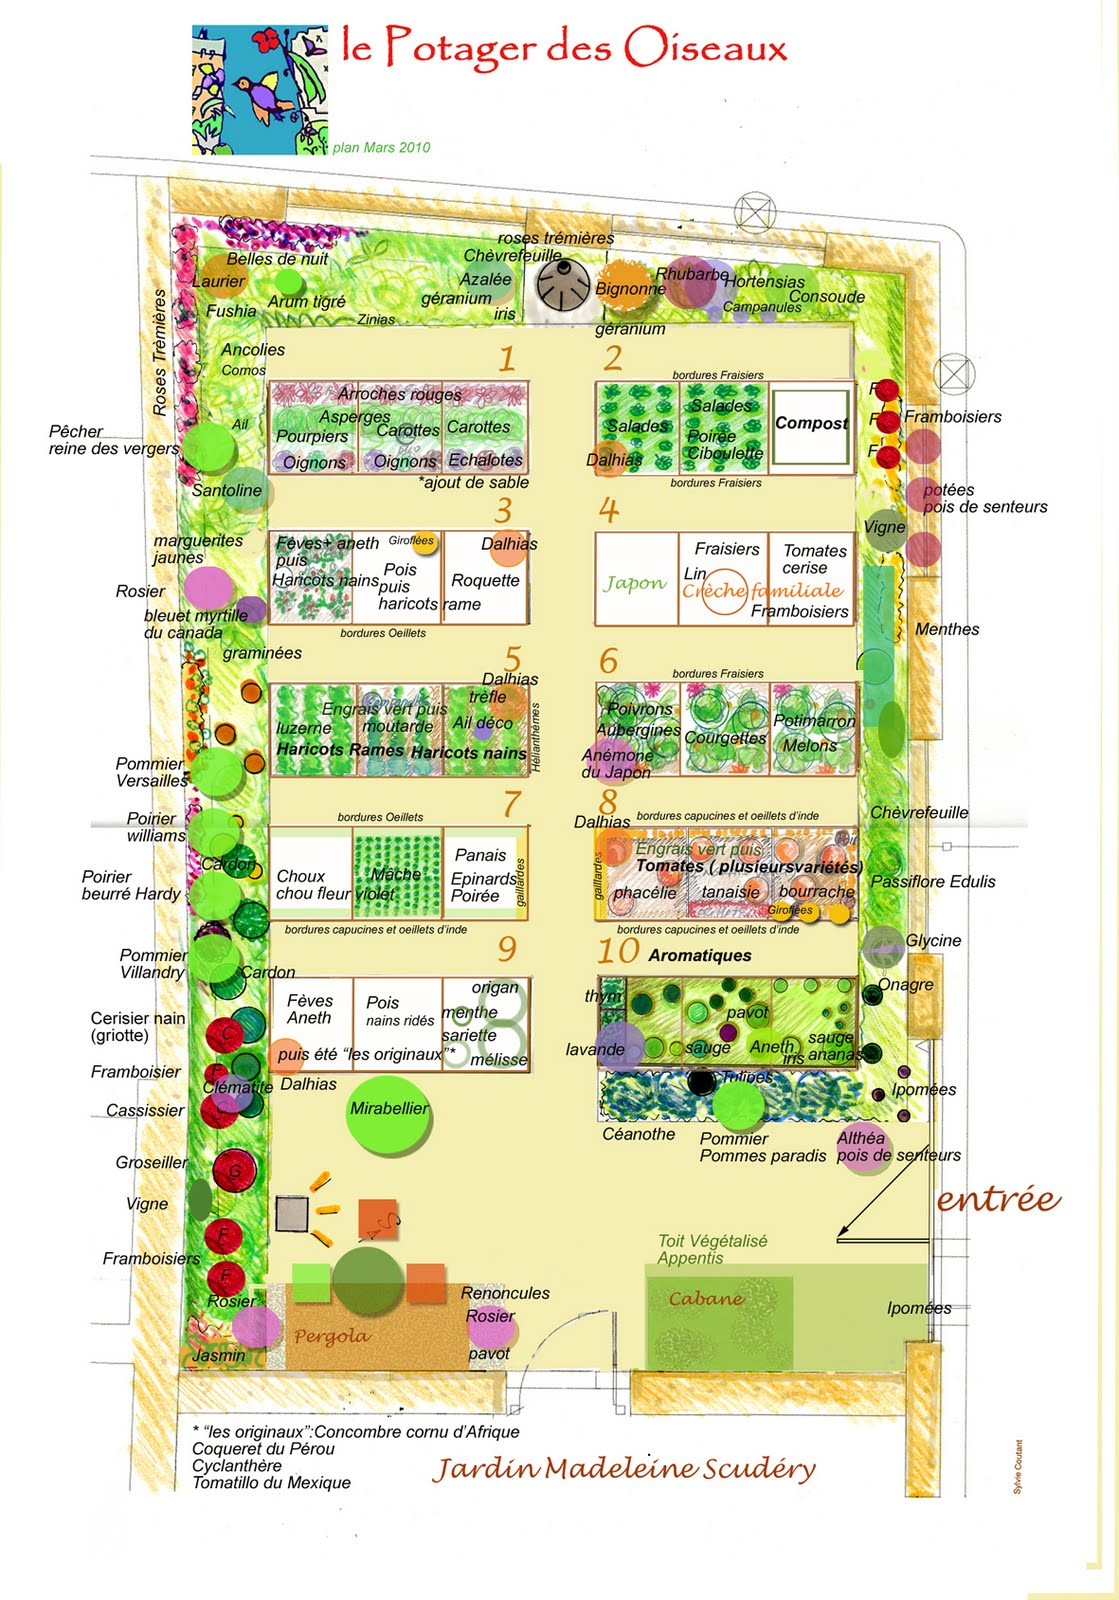 le jardin potager c 39 est comme a en 2010. Black Bedroom Furniture Sets. Home Design Ideas